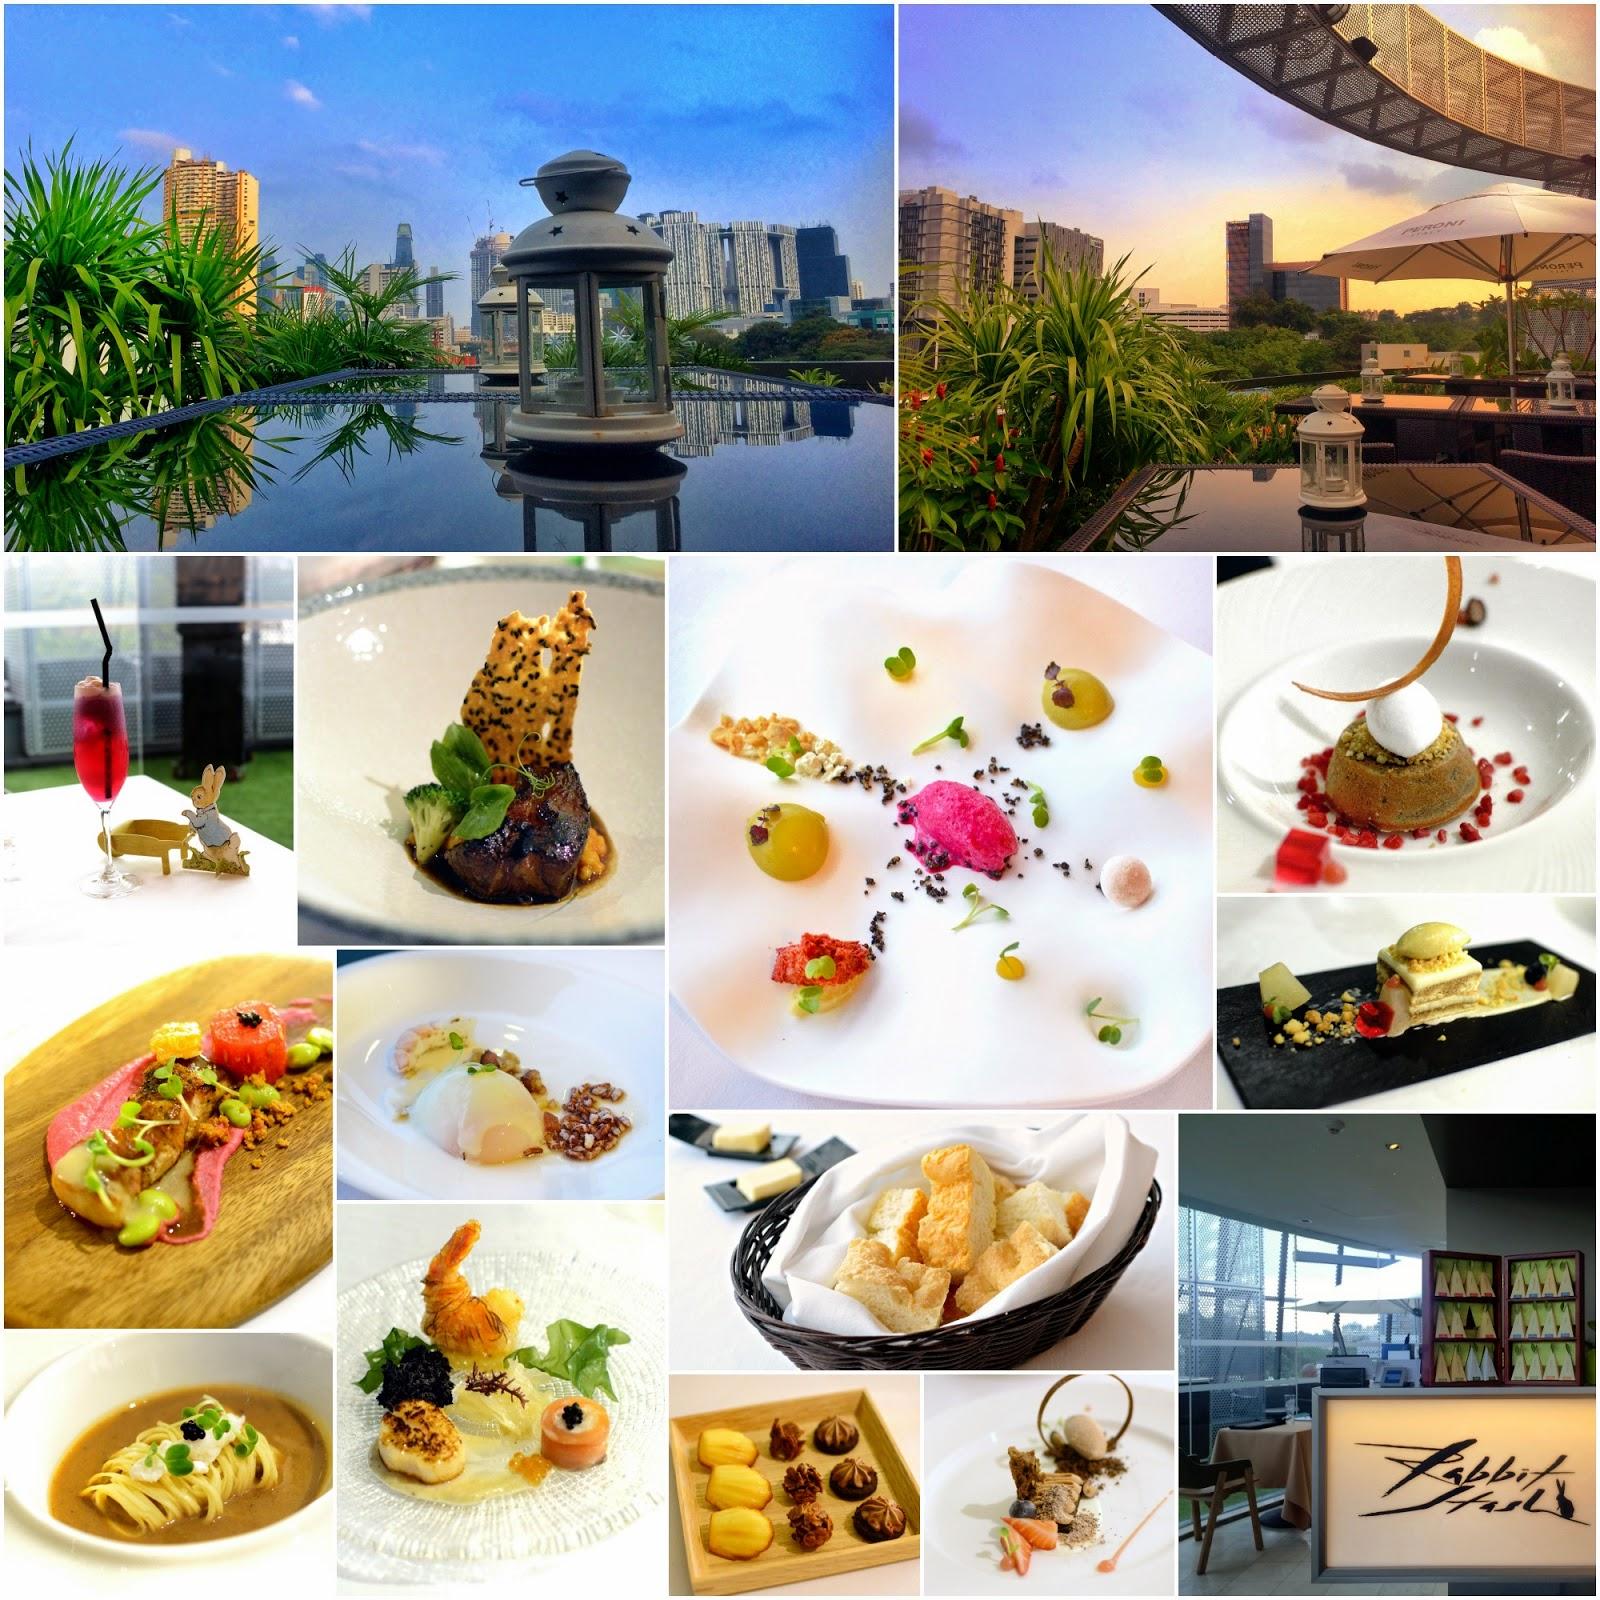 http://www.chocolatemuimui.com/2015/04/wangz-hotel-rabbit-stash.html